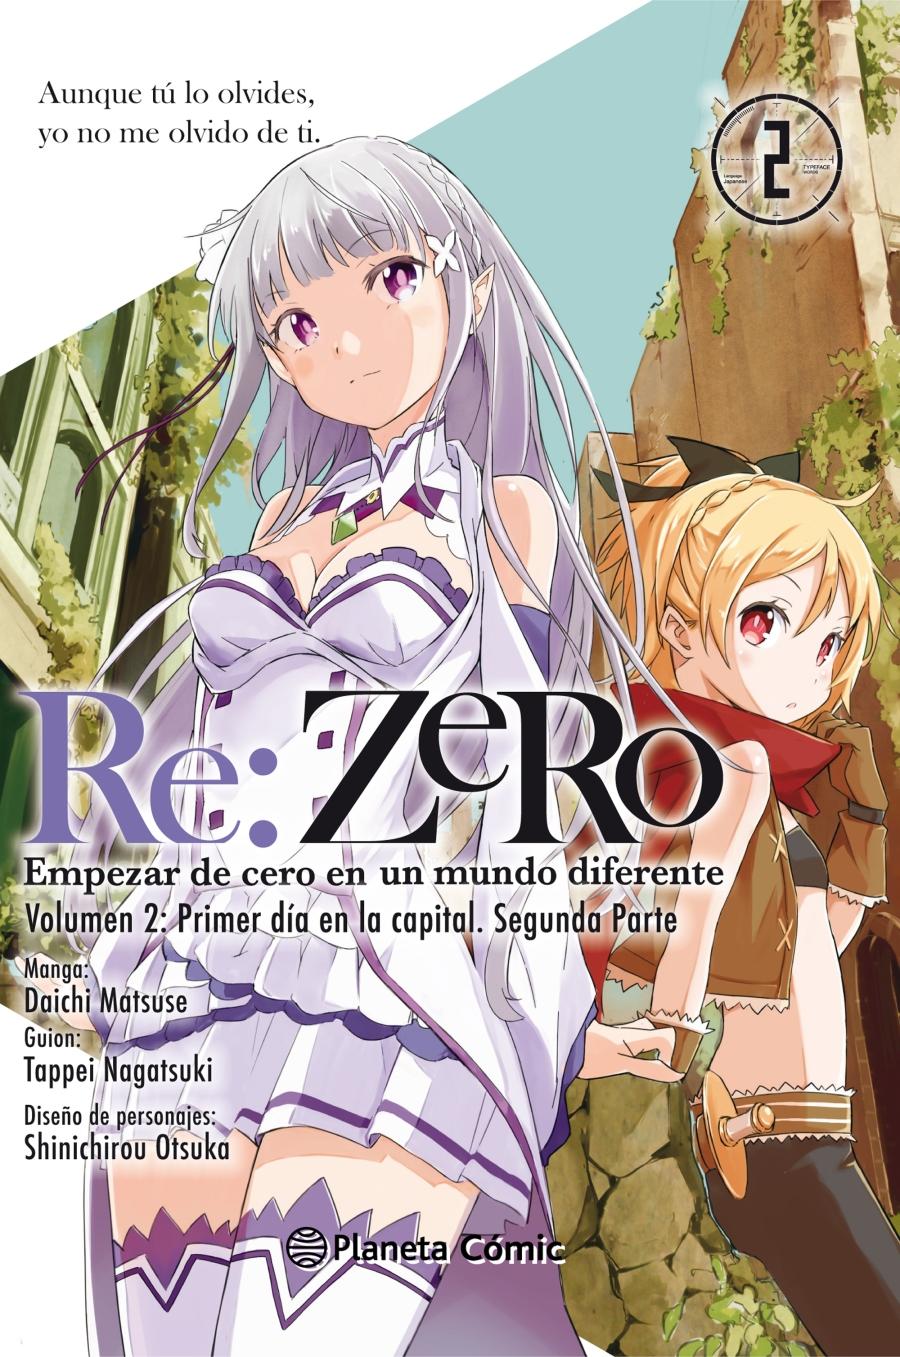 ReZero_02_Sobrecubierta.indd